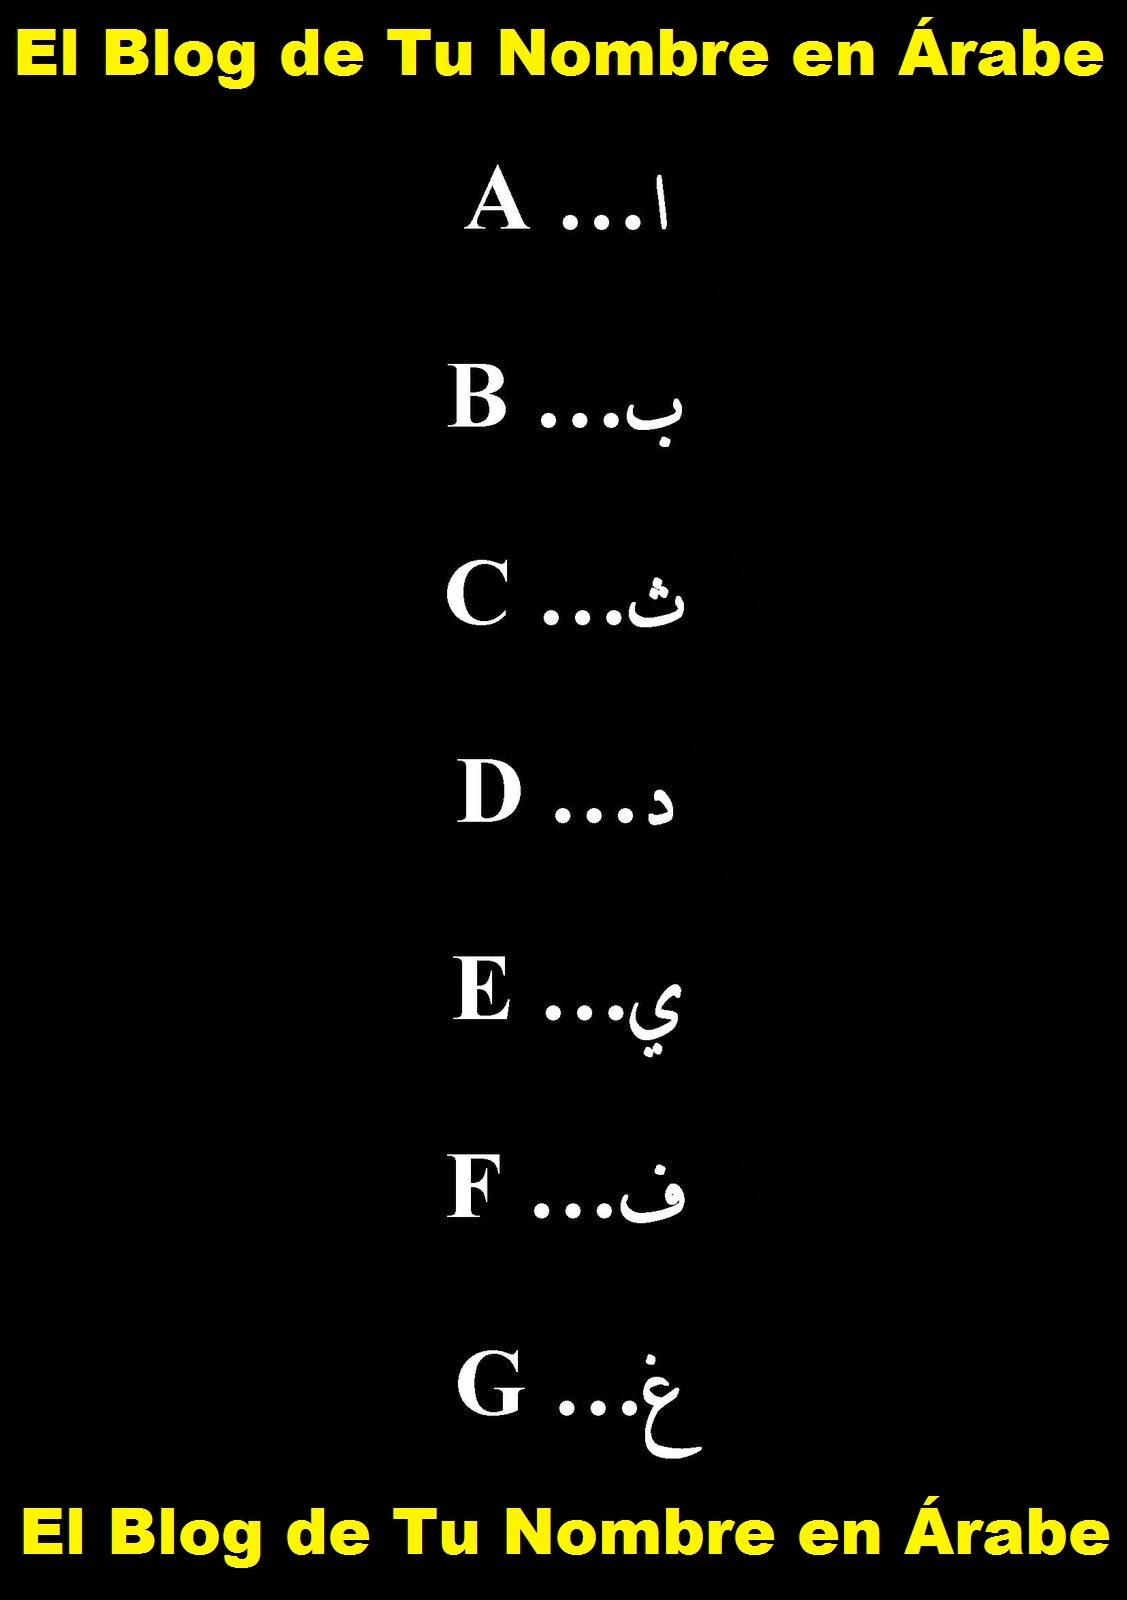 LETRAS ARABES: A B C D E F G